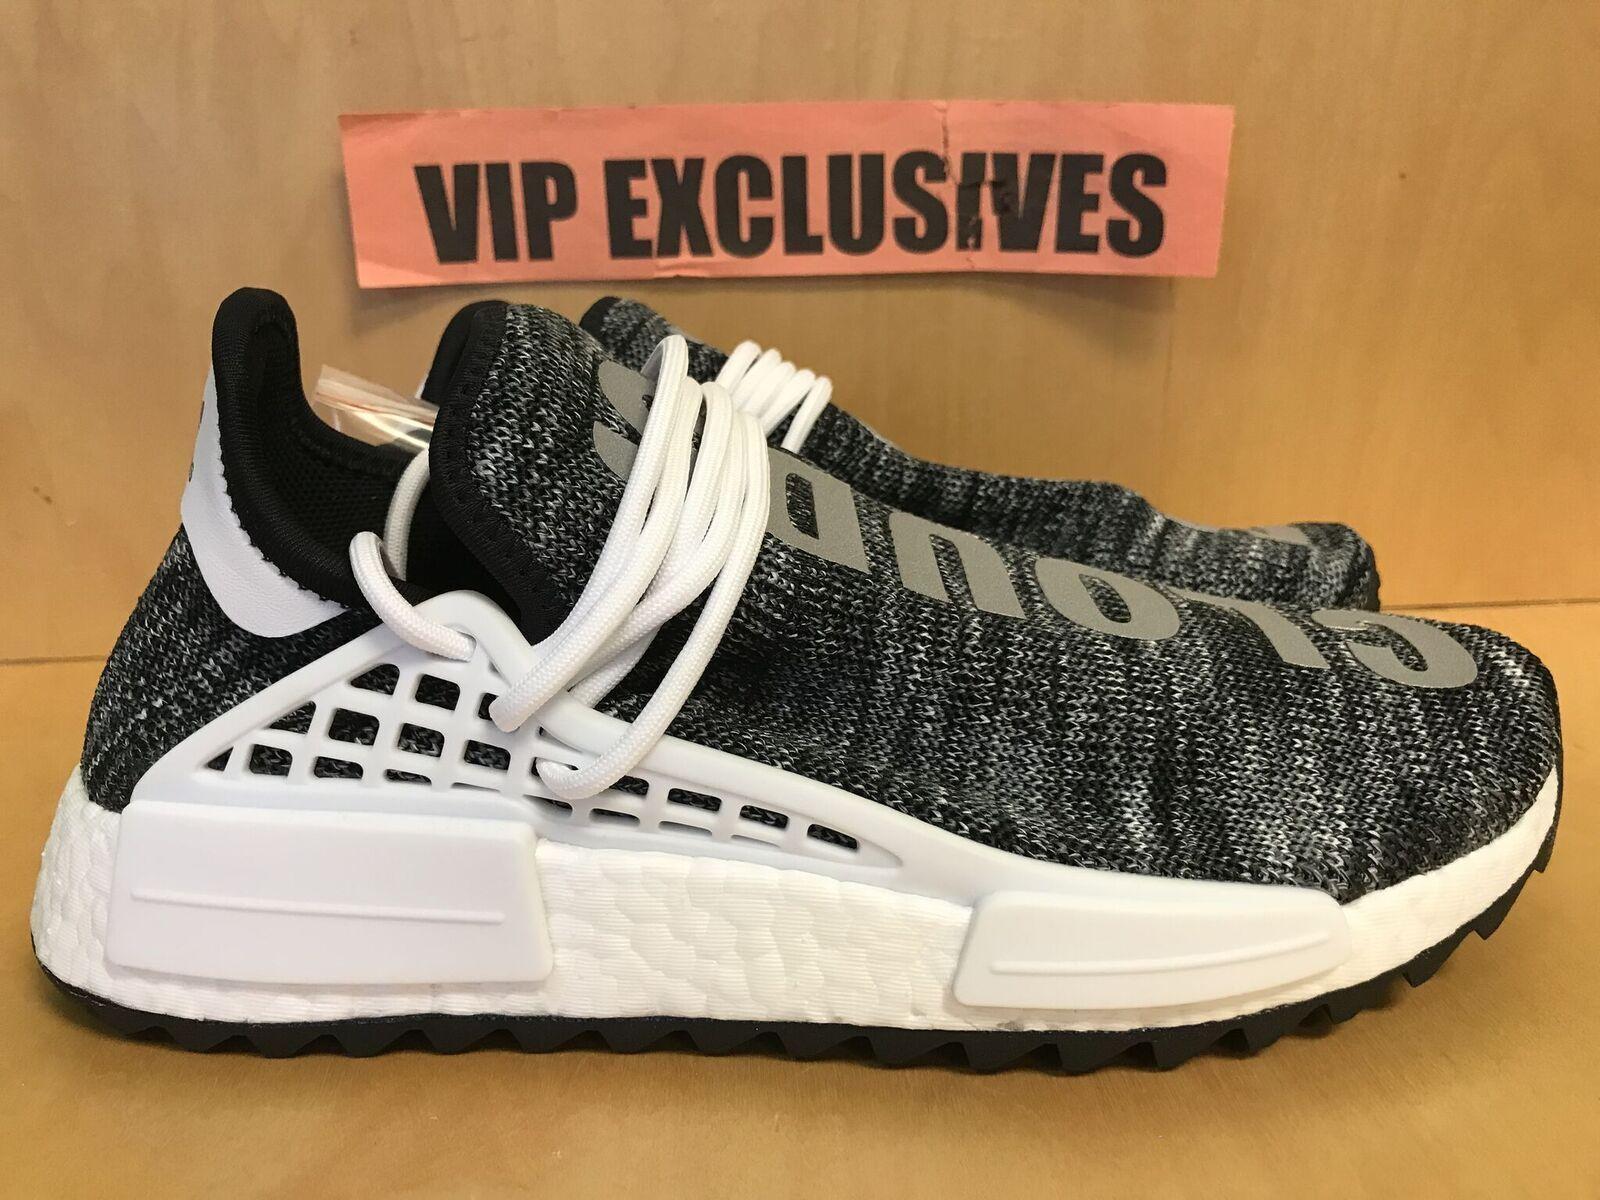 Adidas NMD Human Race Trail Pharrell Williams Black White Hu Cloud Oreo AC7359